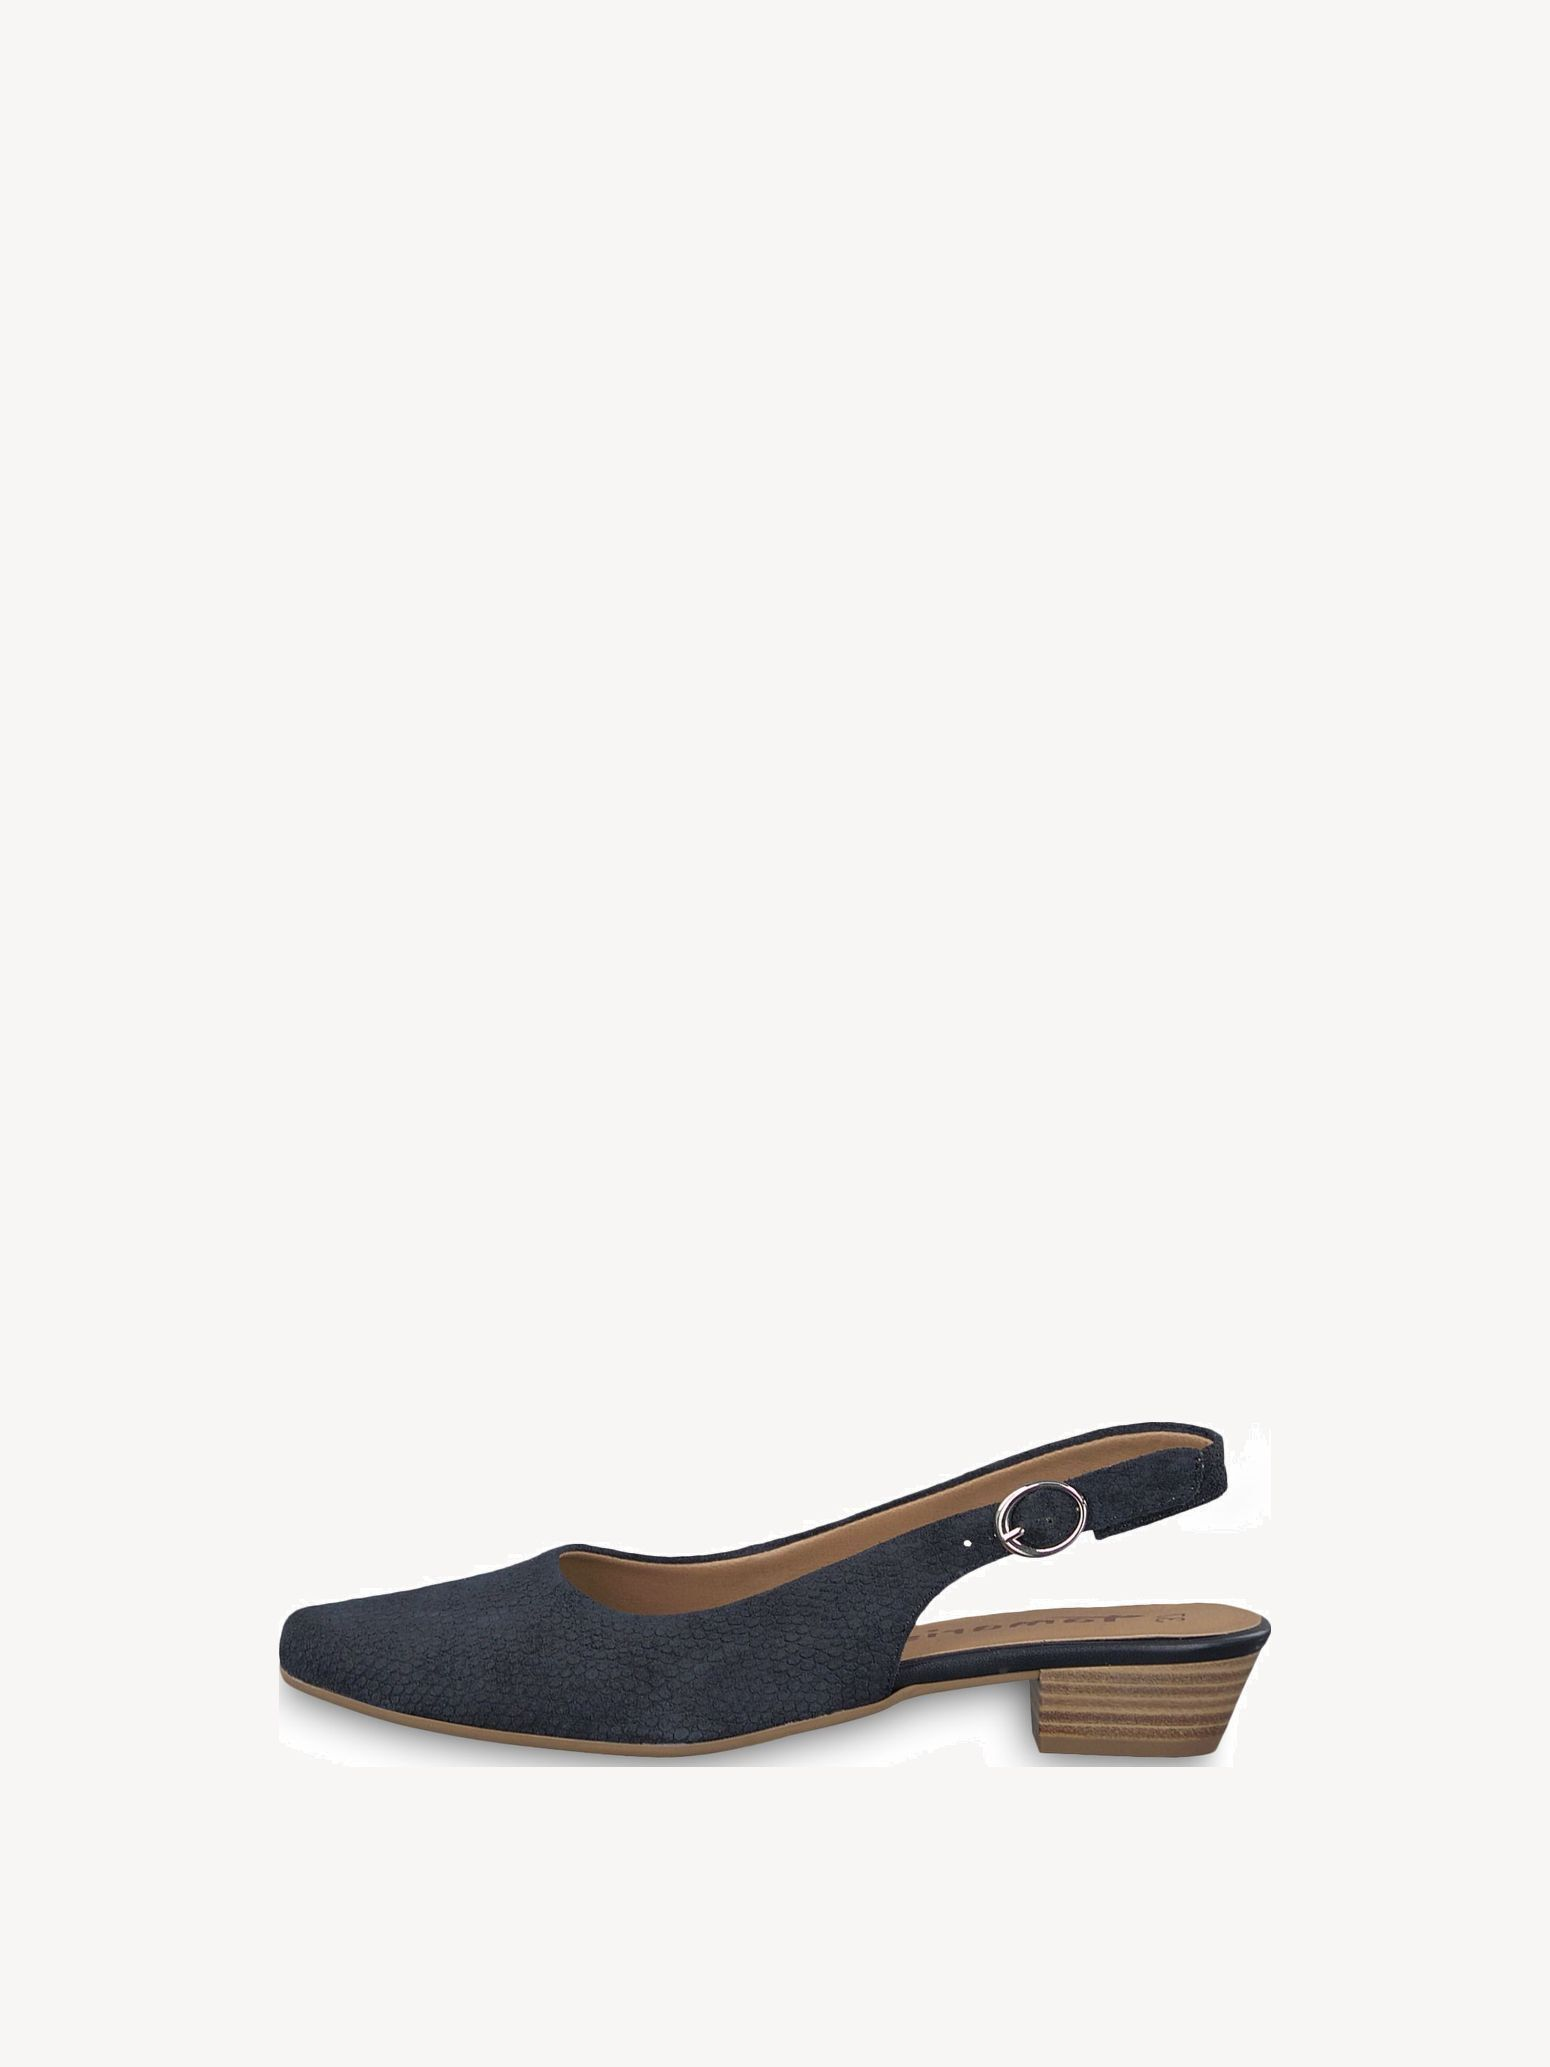 Chaussures Tamaris gris anthracite Casual QGNXNUTWR